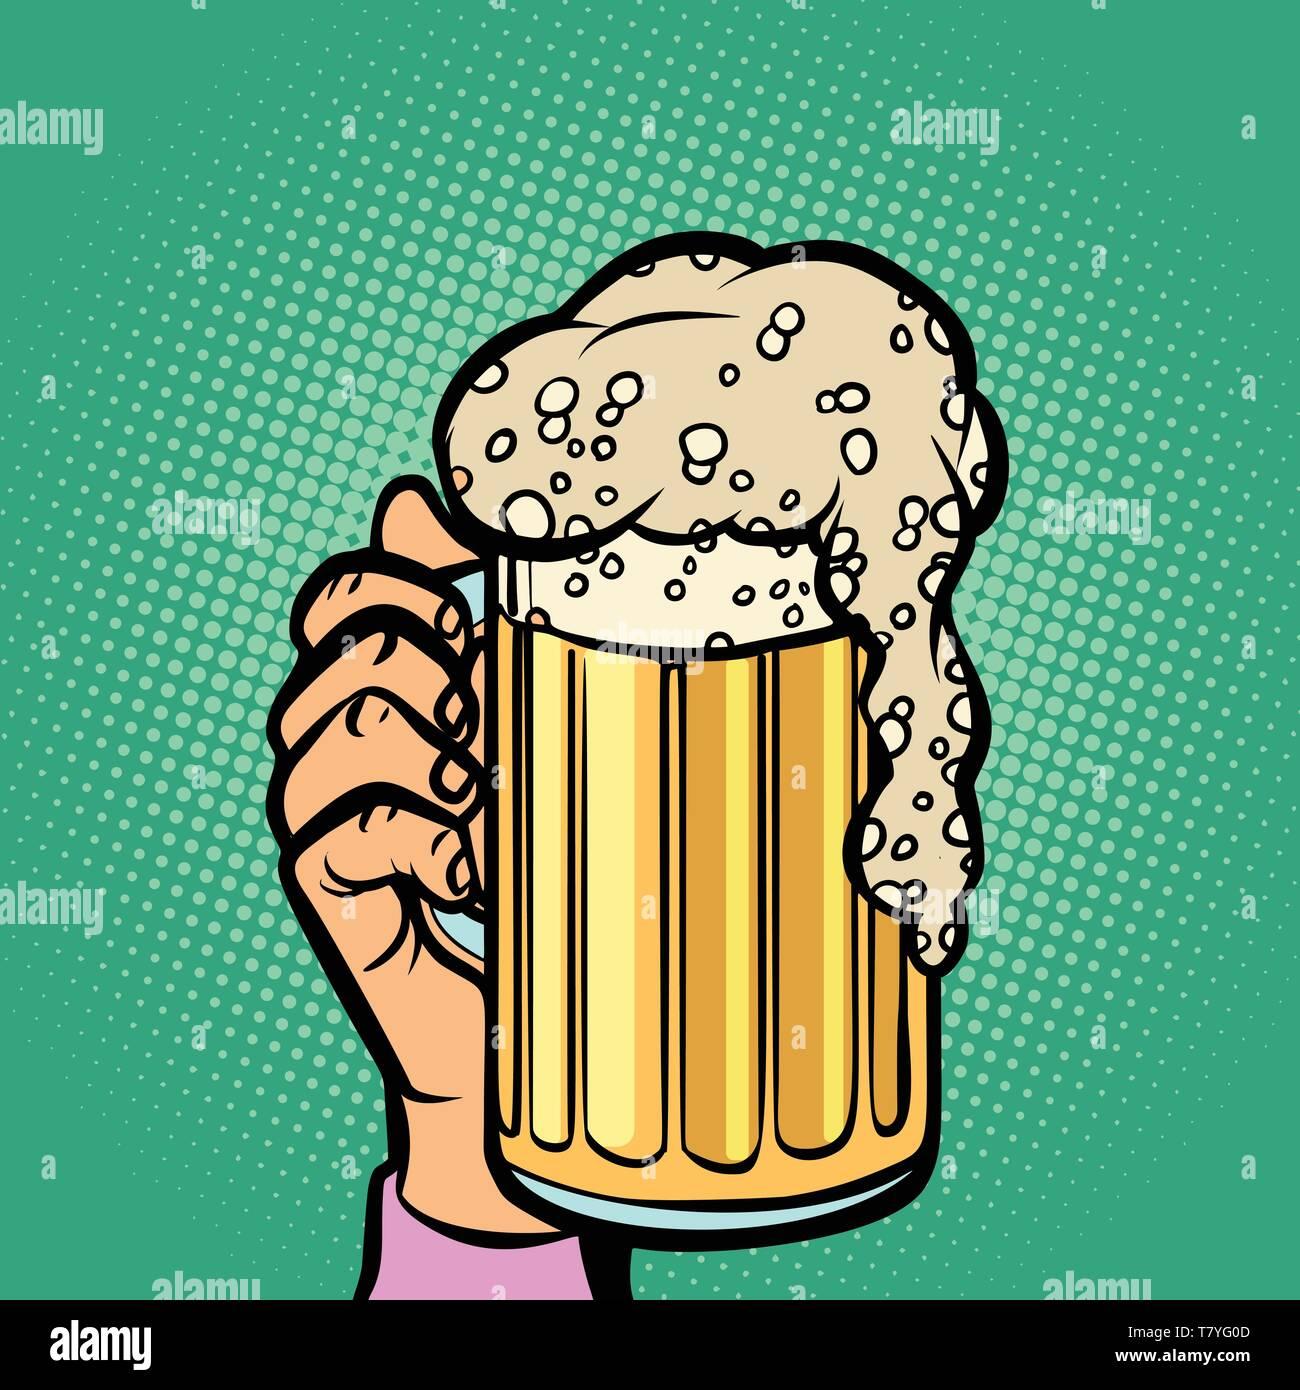 Glass Beer Mug Comic Cartoon Pop Art Retro Vector Illustration Hand Drawing Stock Vector Image Art Alamy